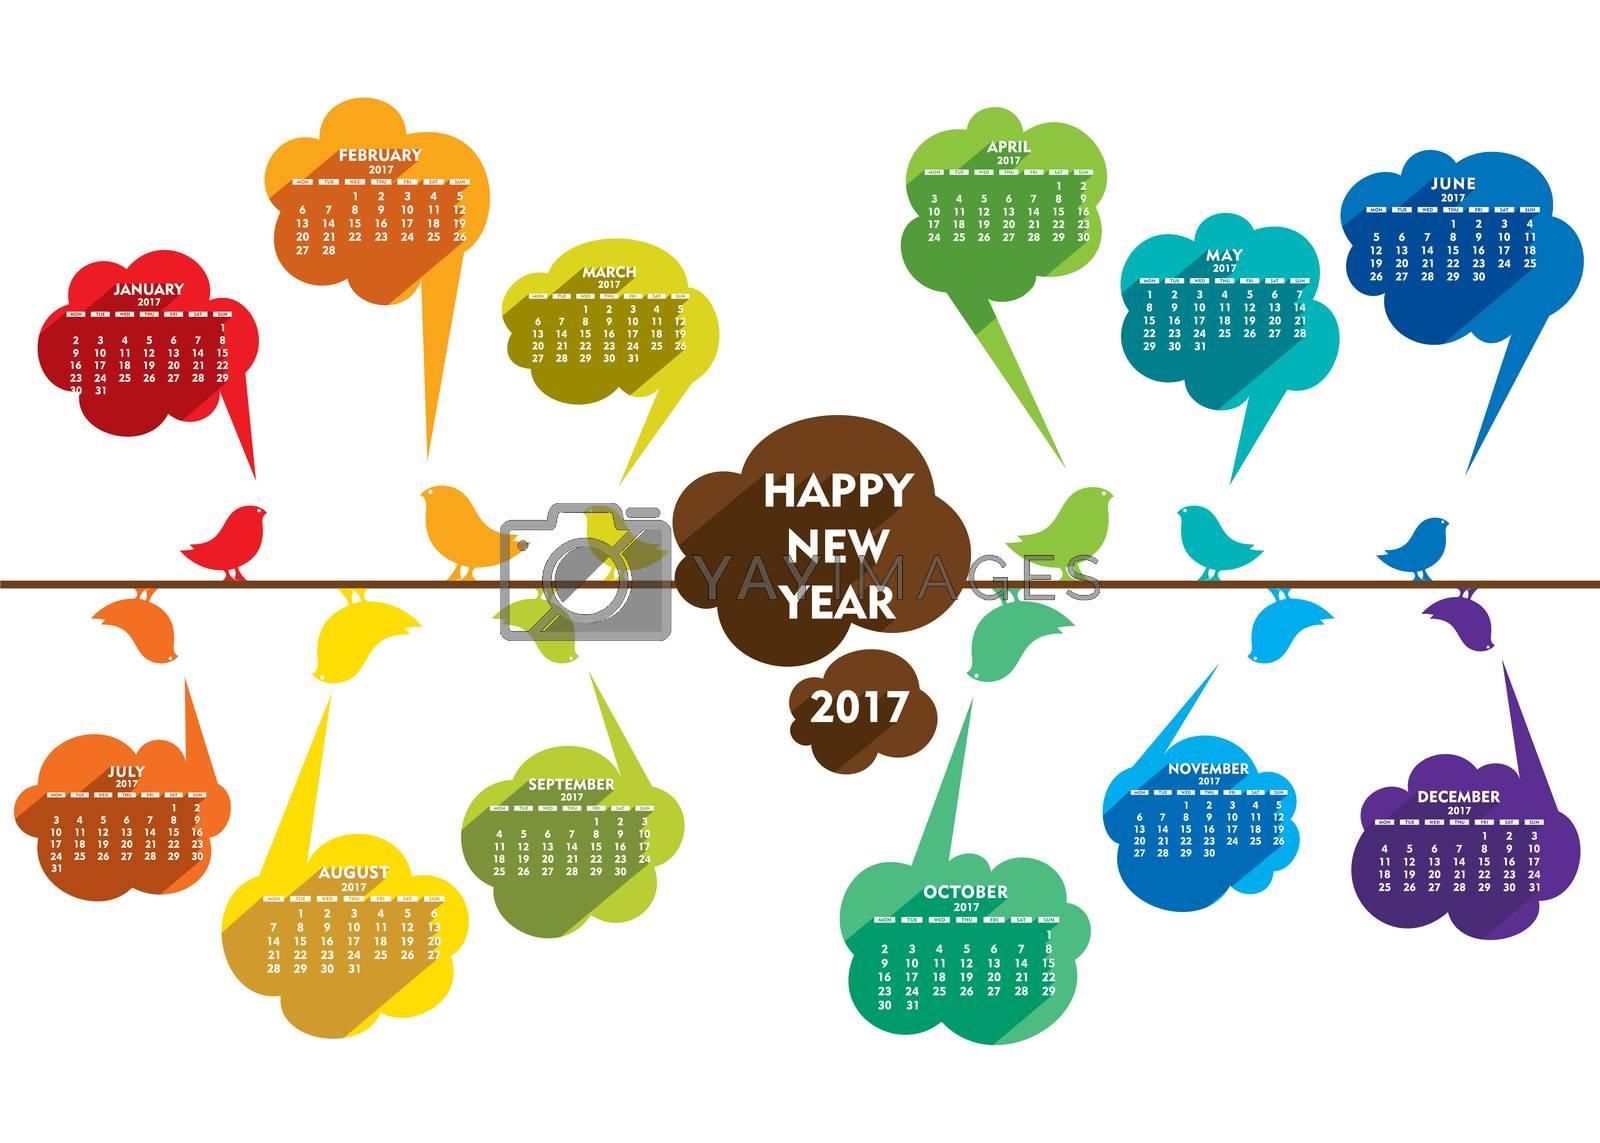 creative happy new year 2017 poster design using bird concept design